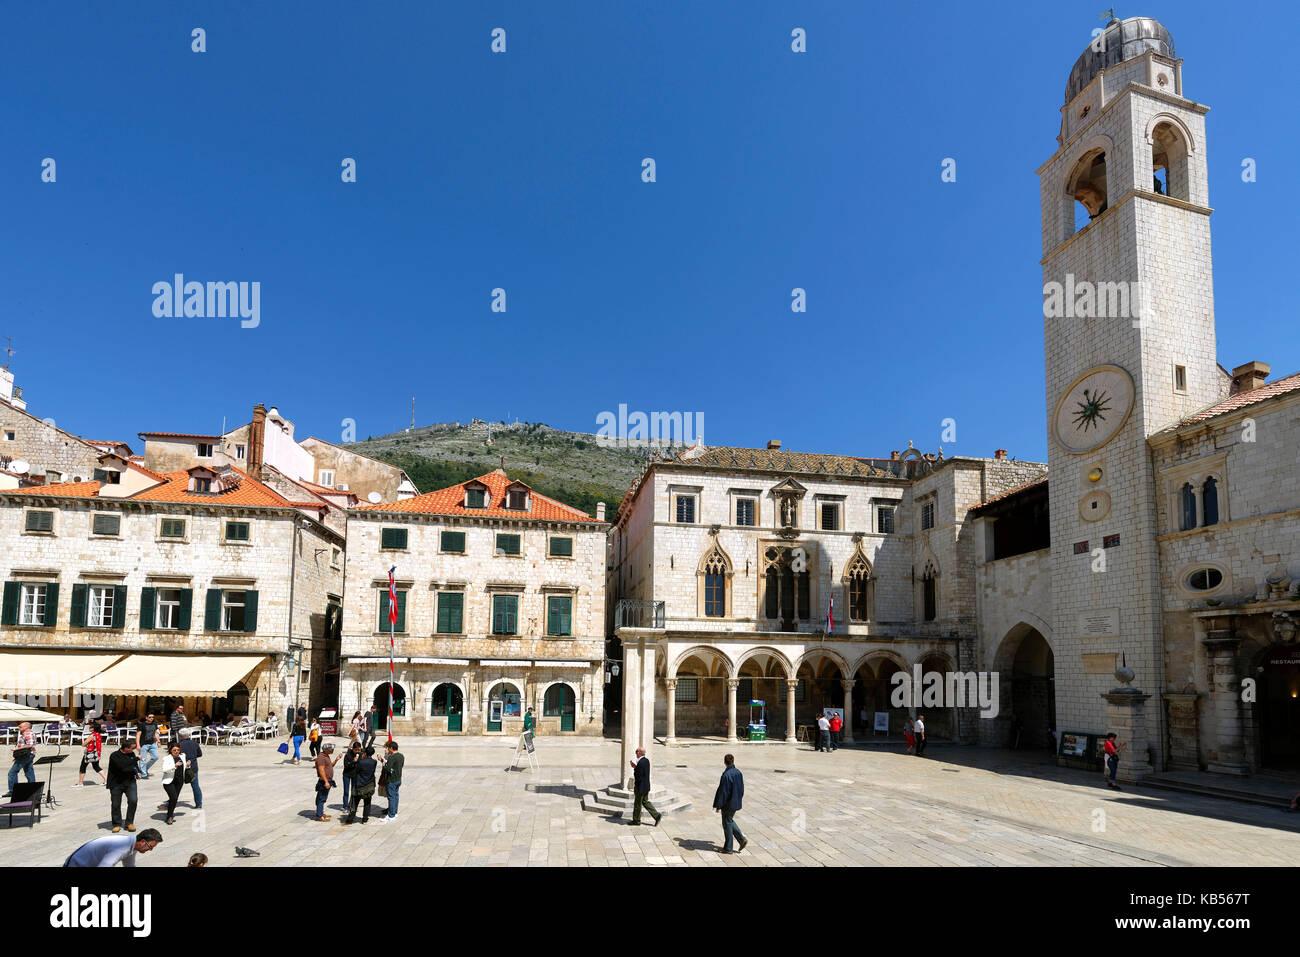 Croatia, Dalmatia, Dalmatian coast, Dubrovnik historical centre, listed as World Heritage by UNESCO, Luza square - Stock Image